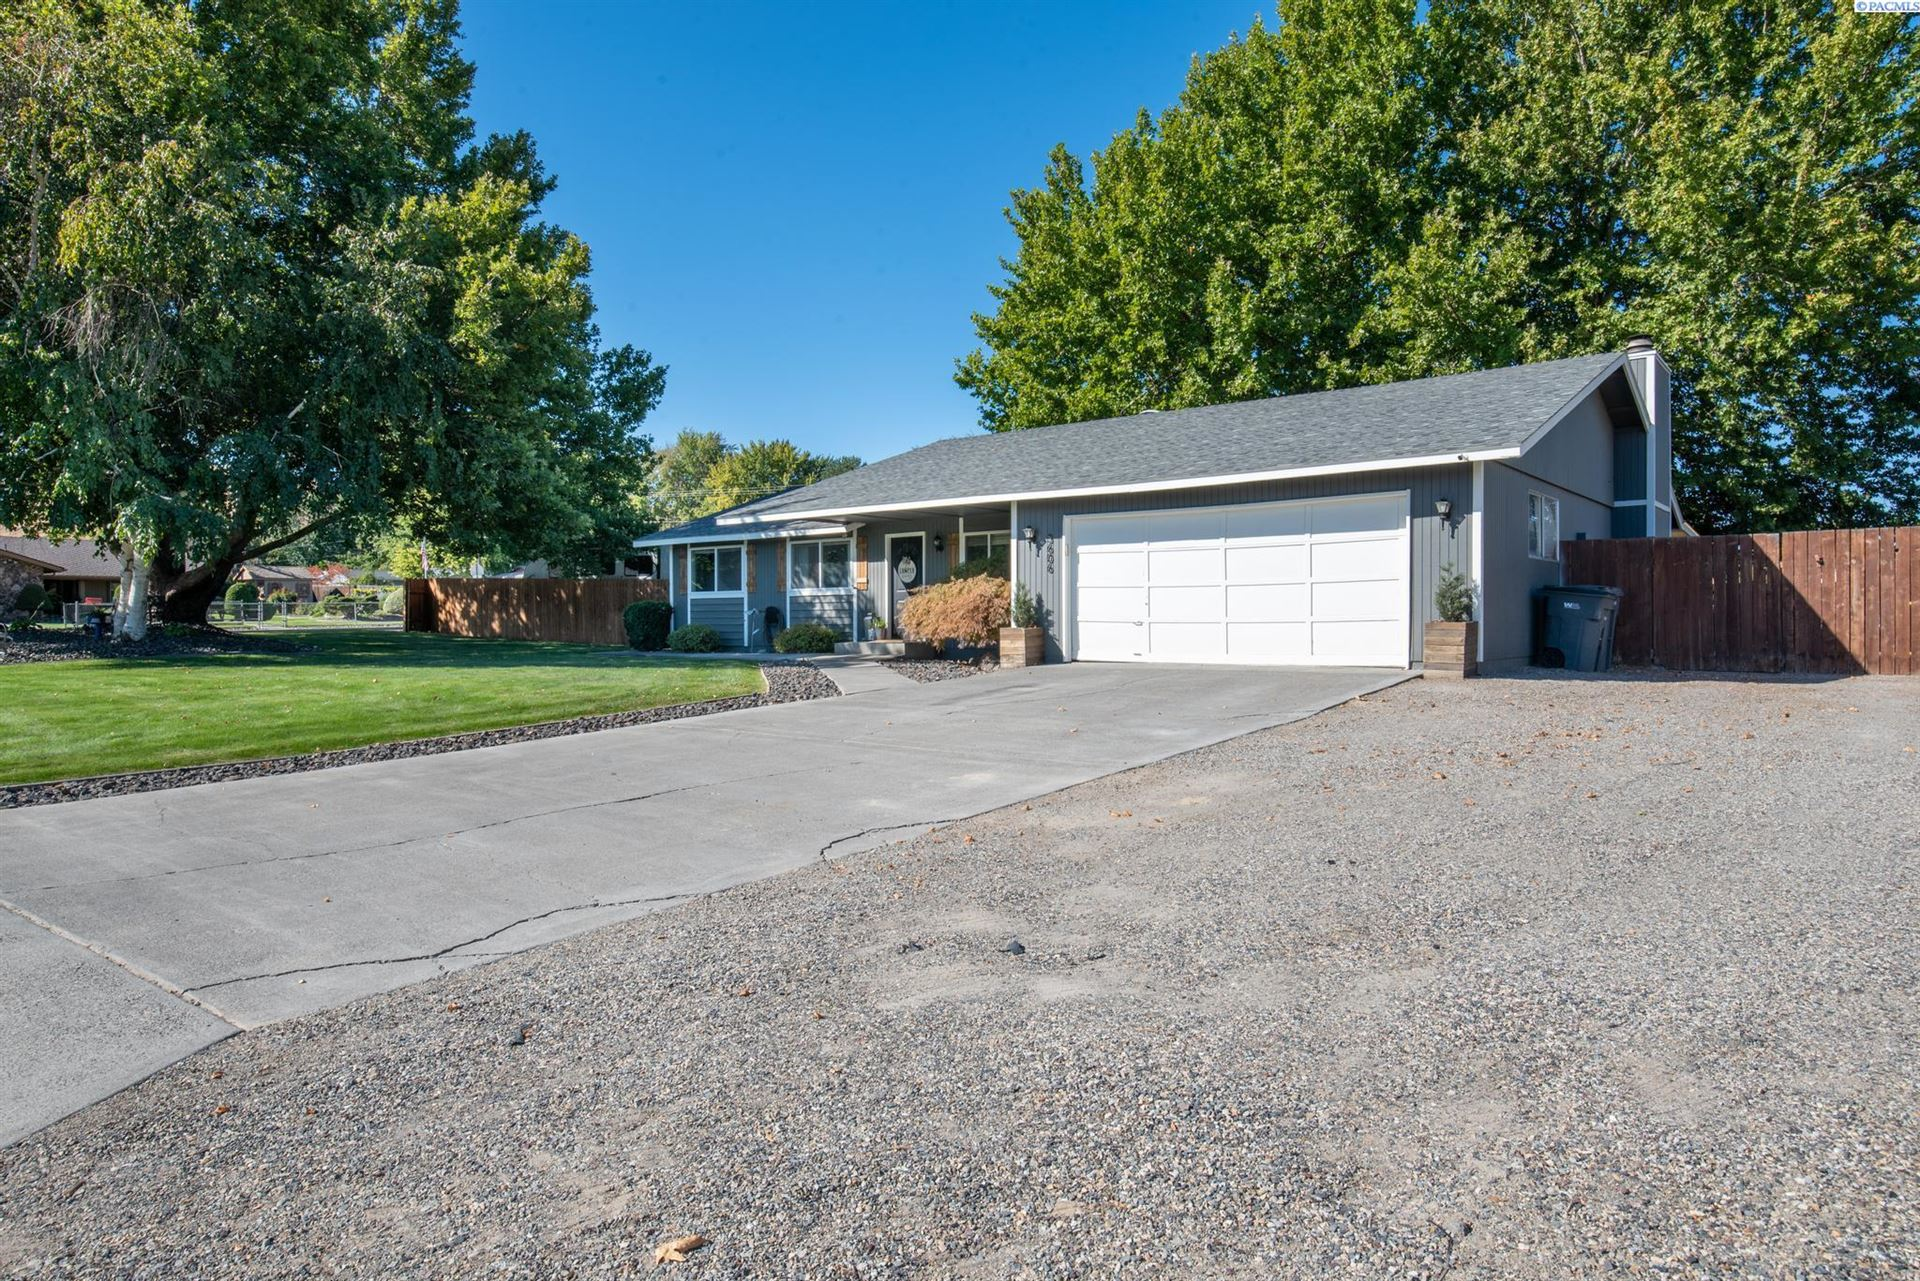 Photo of 3606 S Underwood St, Kennewick, WA 99337 (MLS # 256630)